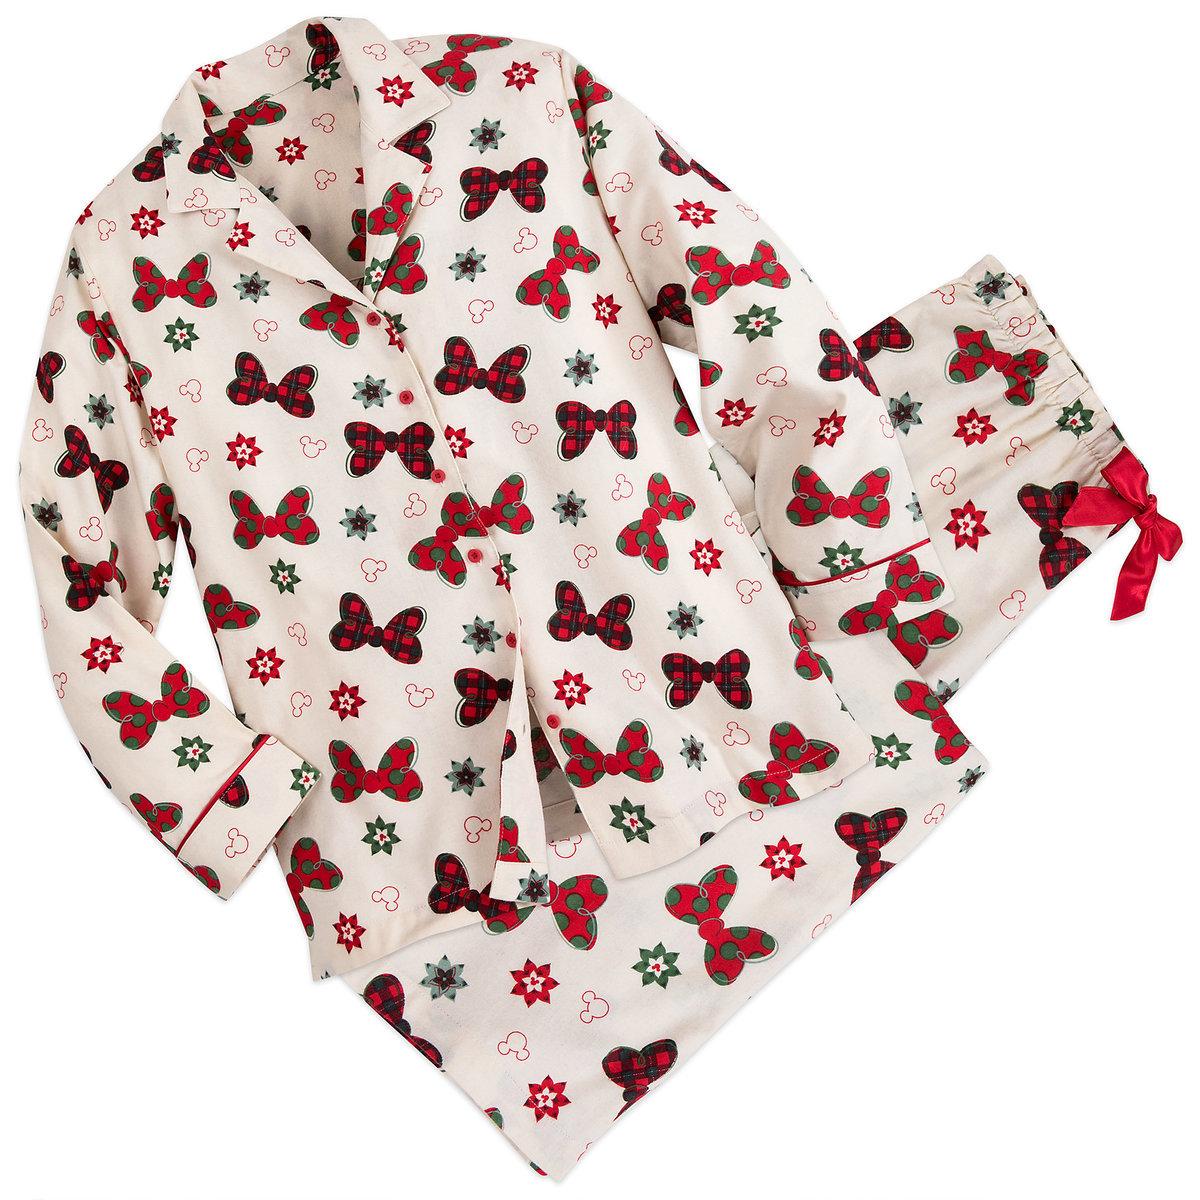 1478849363c51 Disney Ladies Christmas Pajamas - Holiday Flannel Minnie Mouse ...